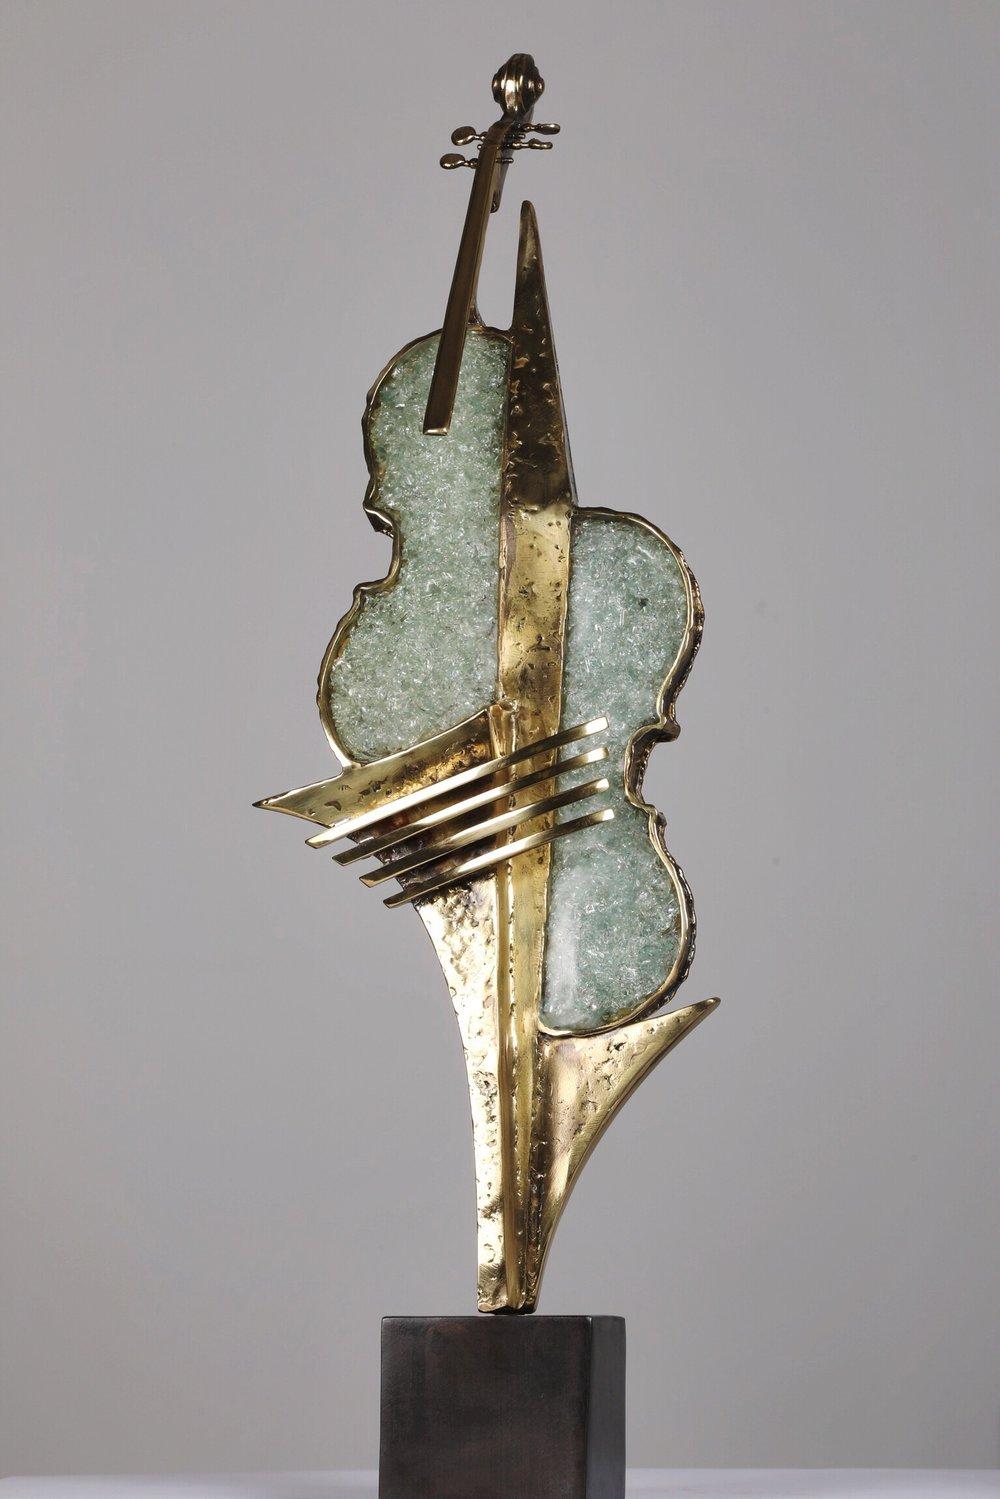 Hommage A Stradivarius - 2012Brass and glassH: 70 cm